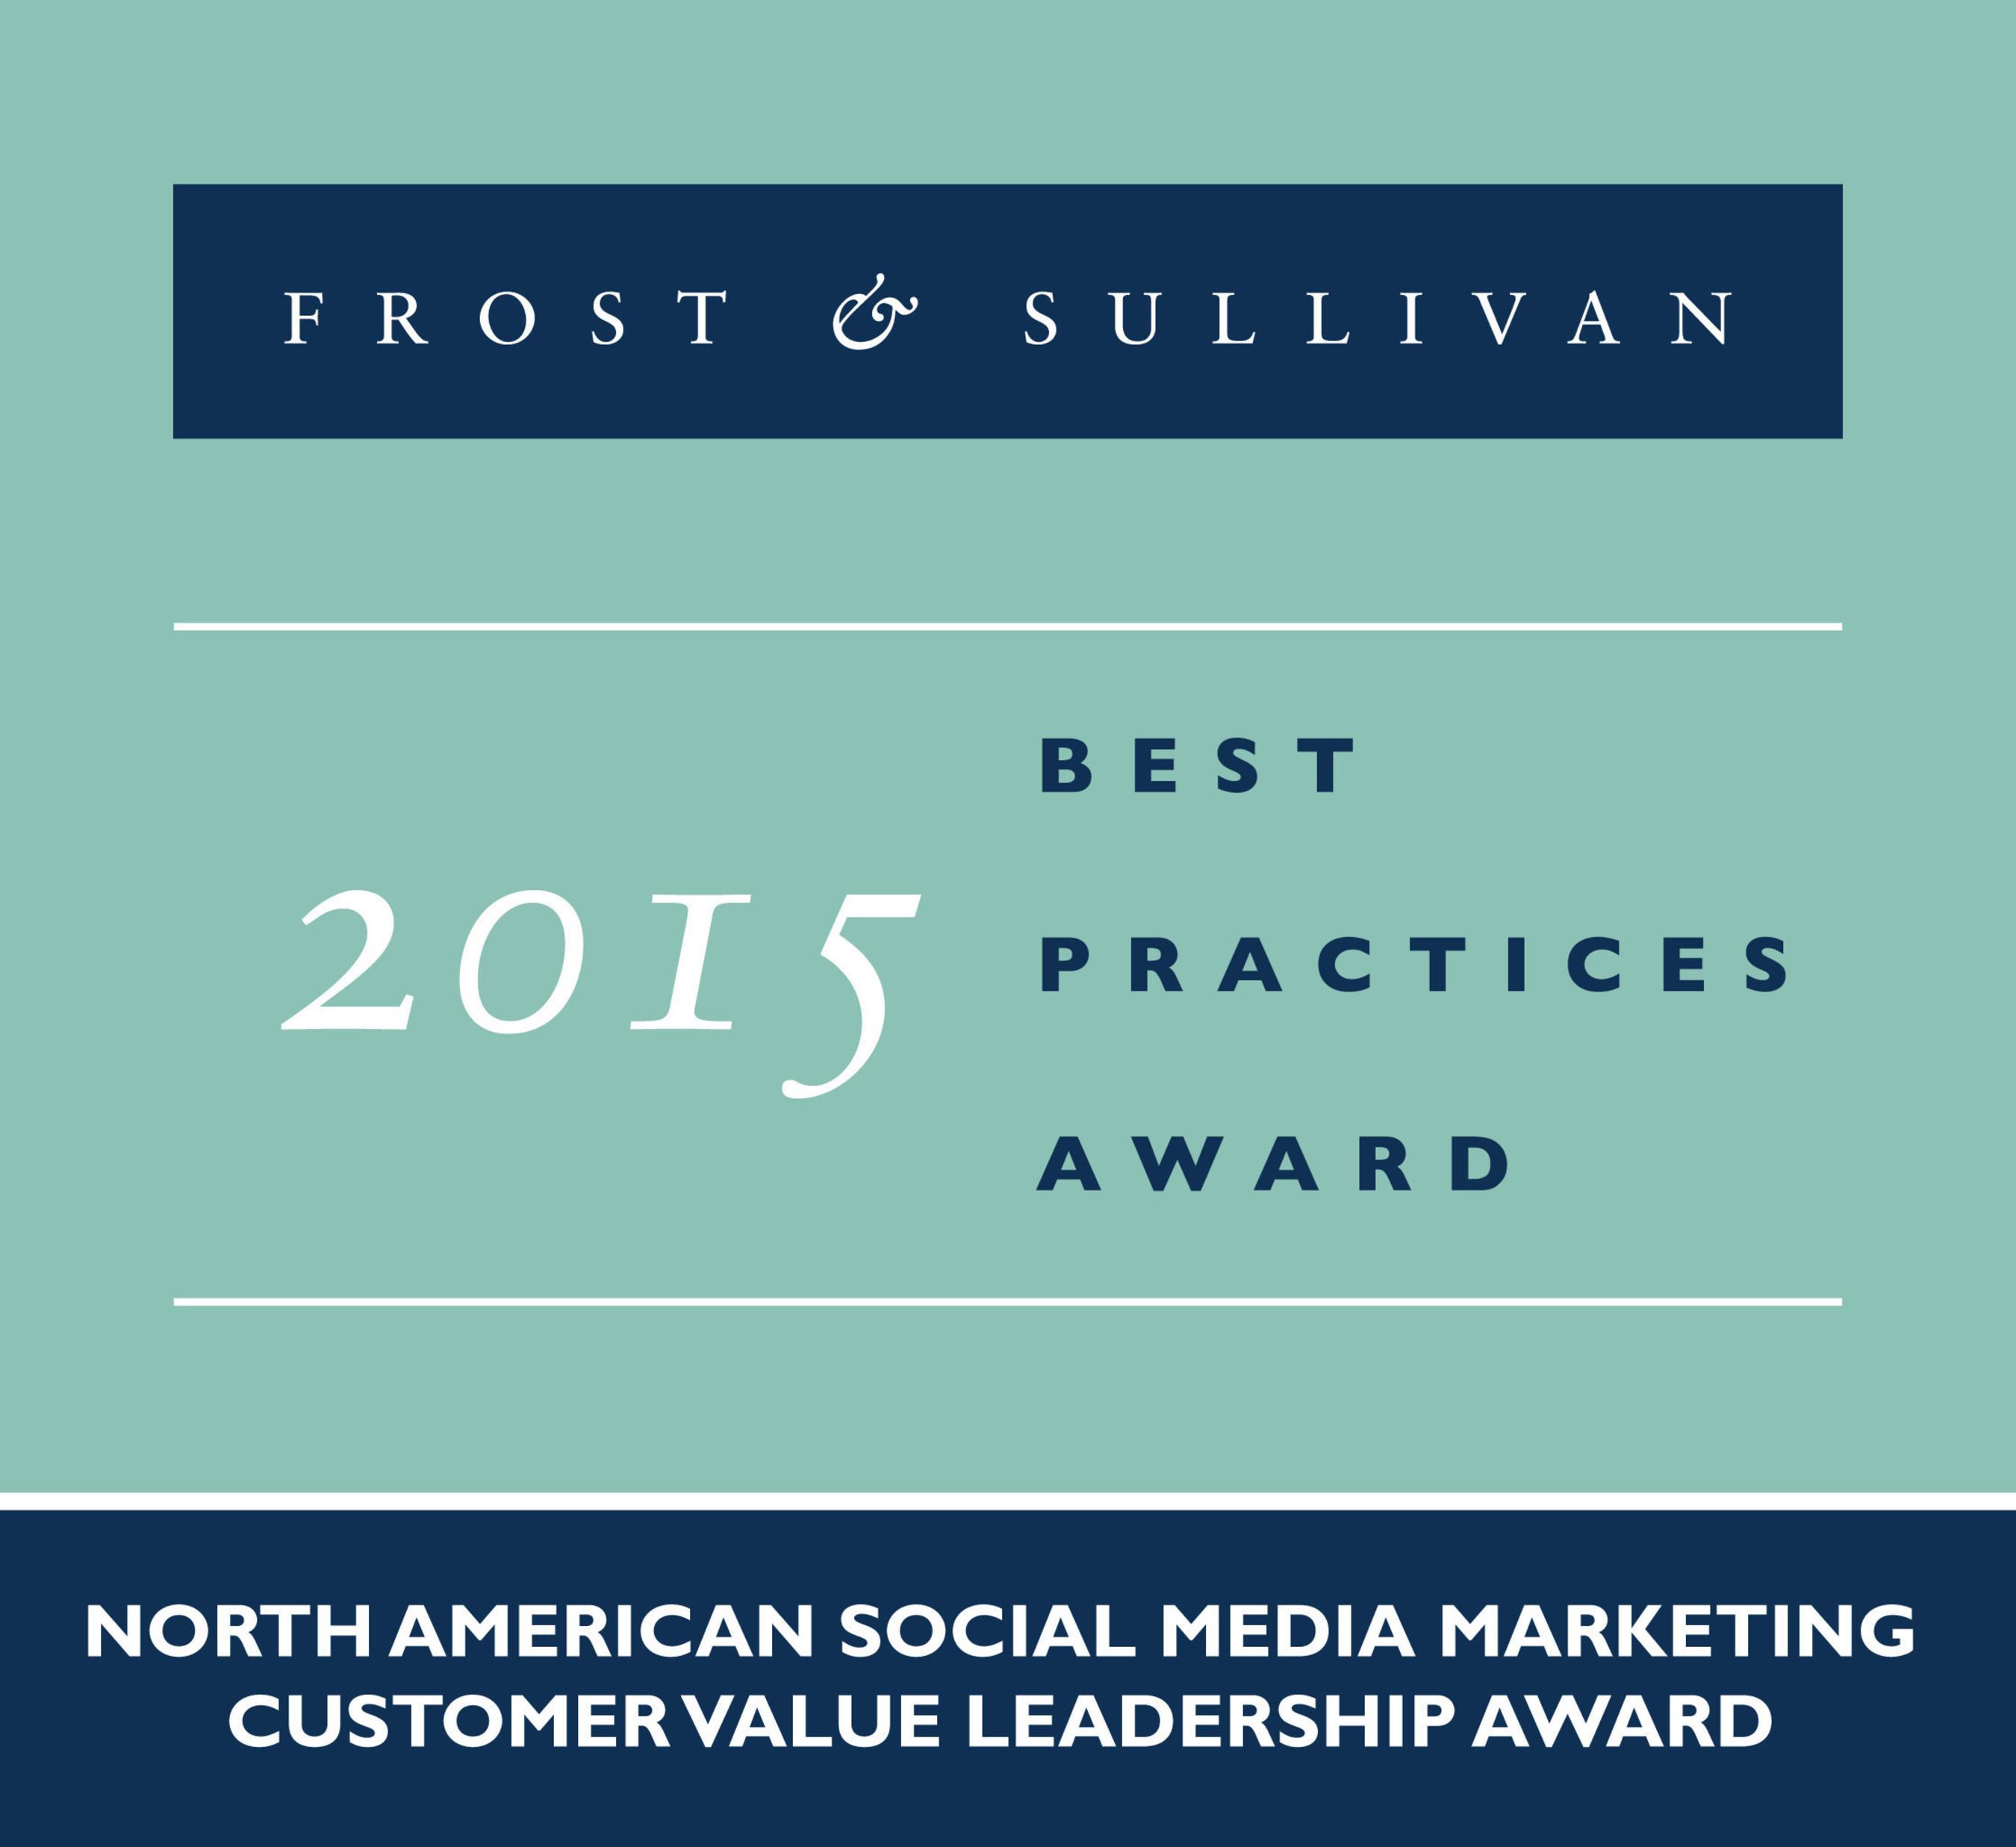 Frost & Sullivan Names IZEA Recipient of 2015 North American Social Media Marketing Customer Value